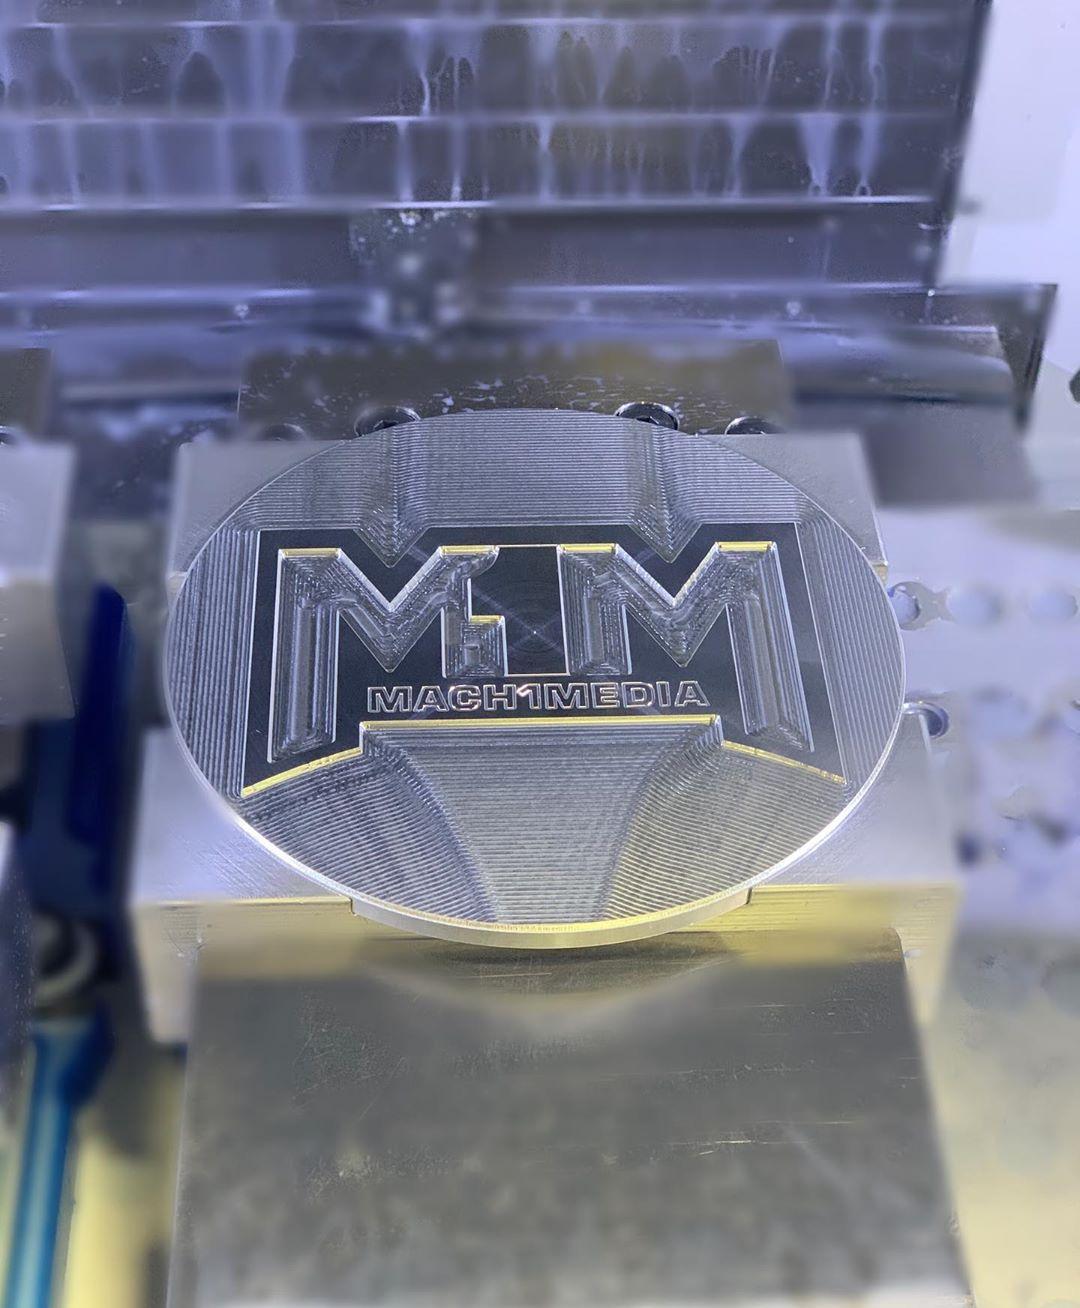 Mach1media